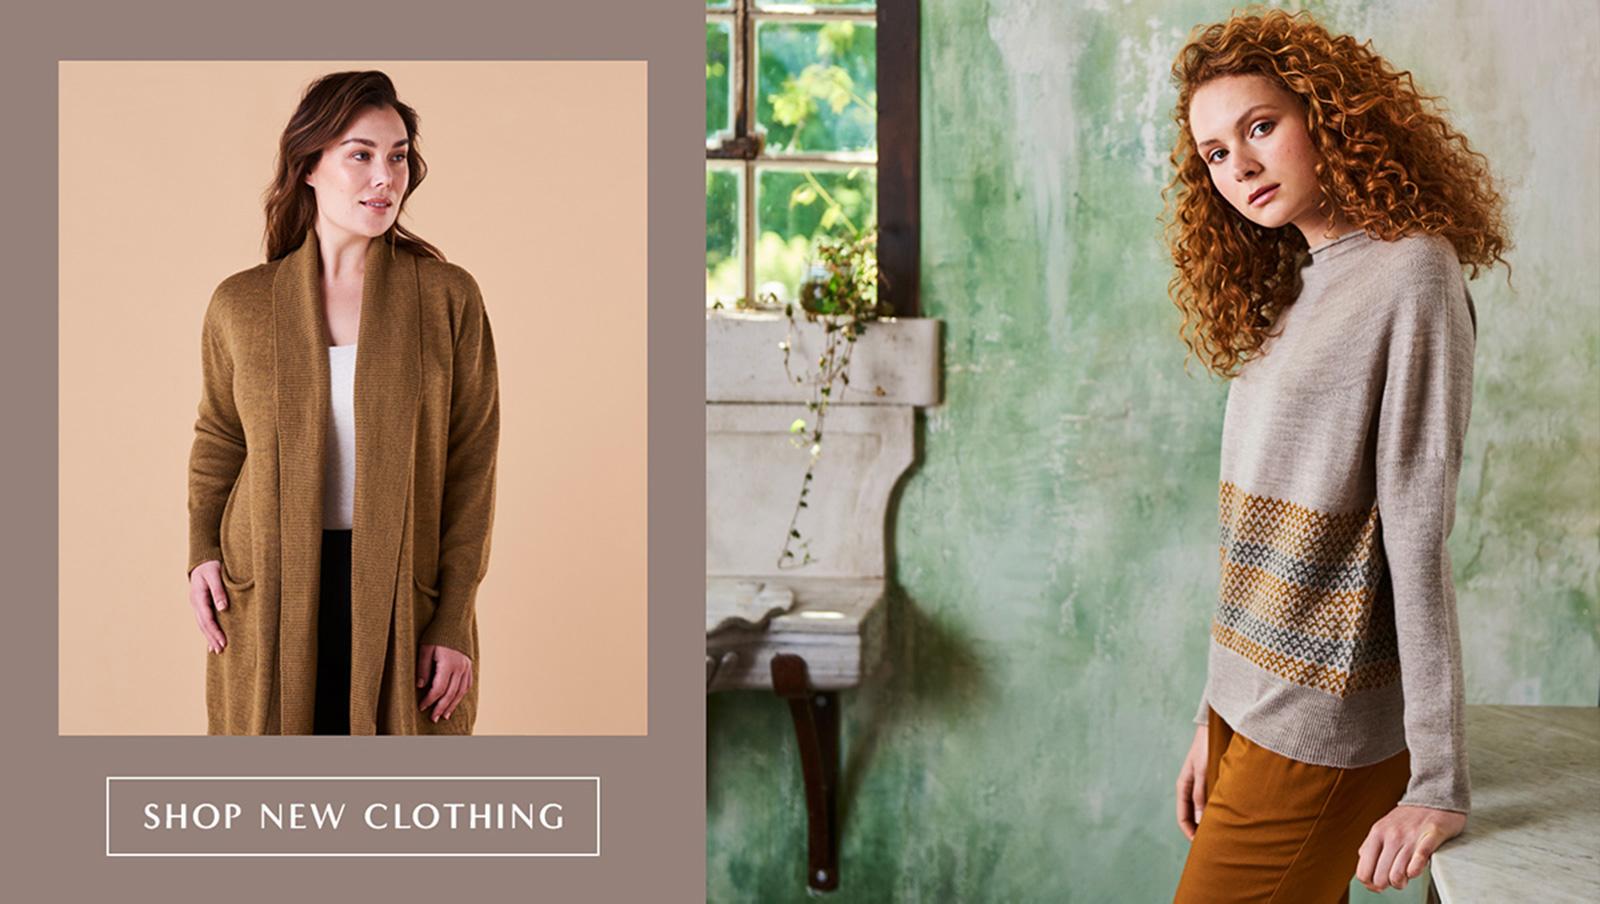 SHOP NEW CLOTHING